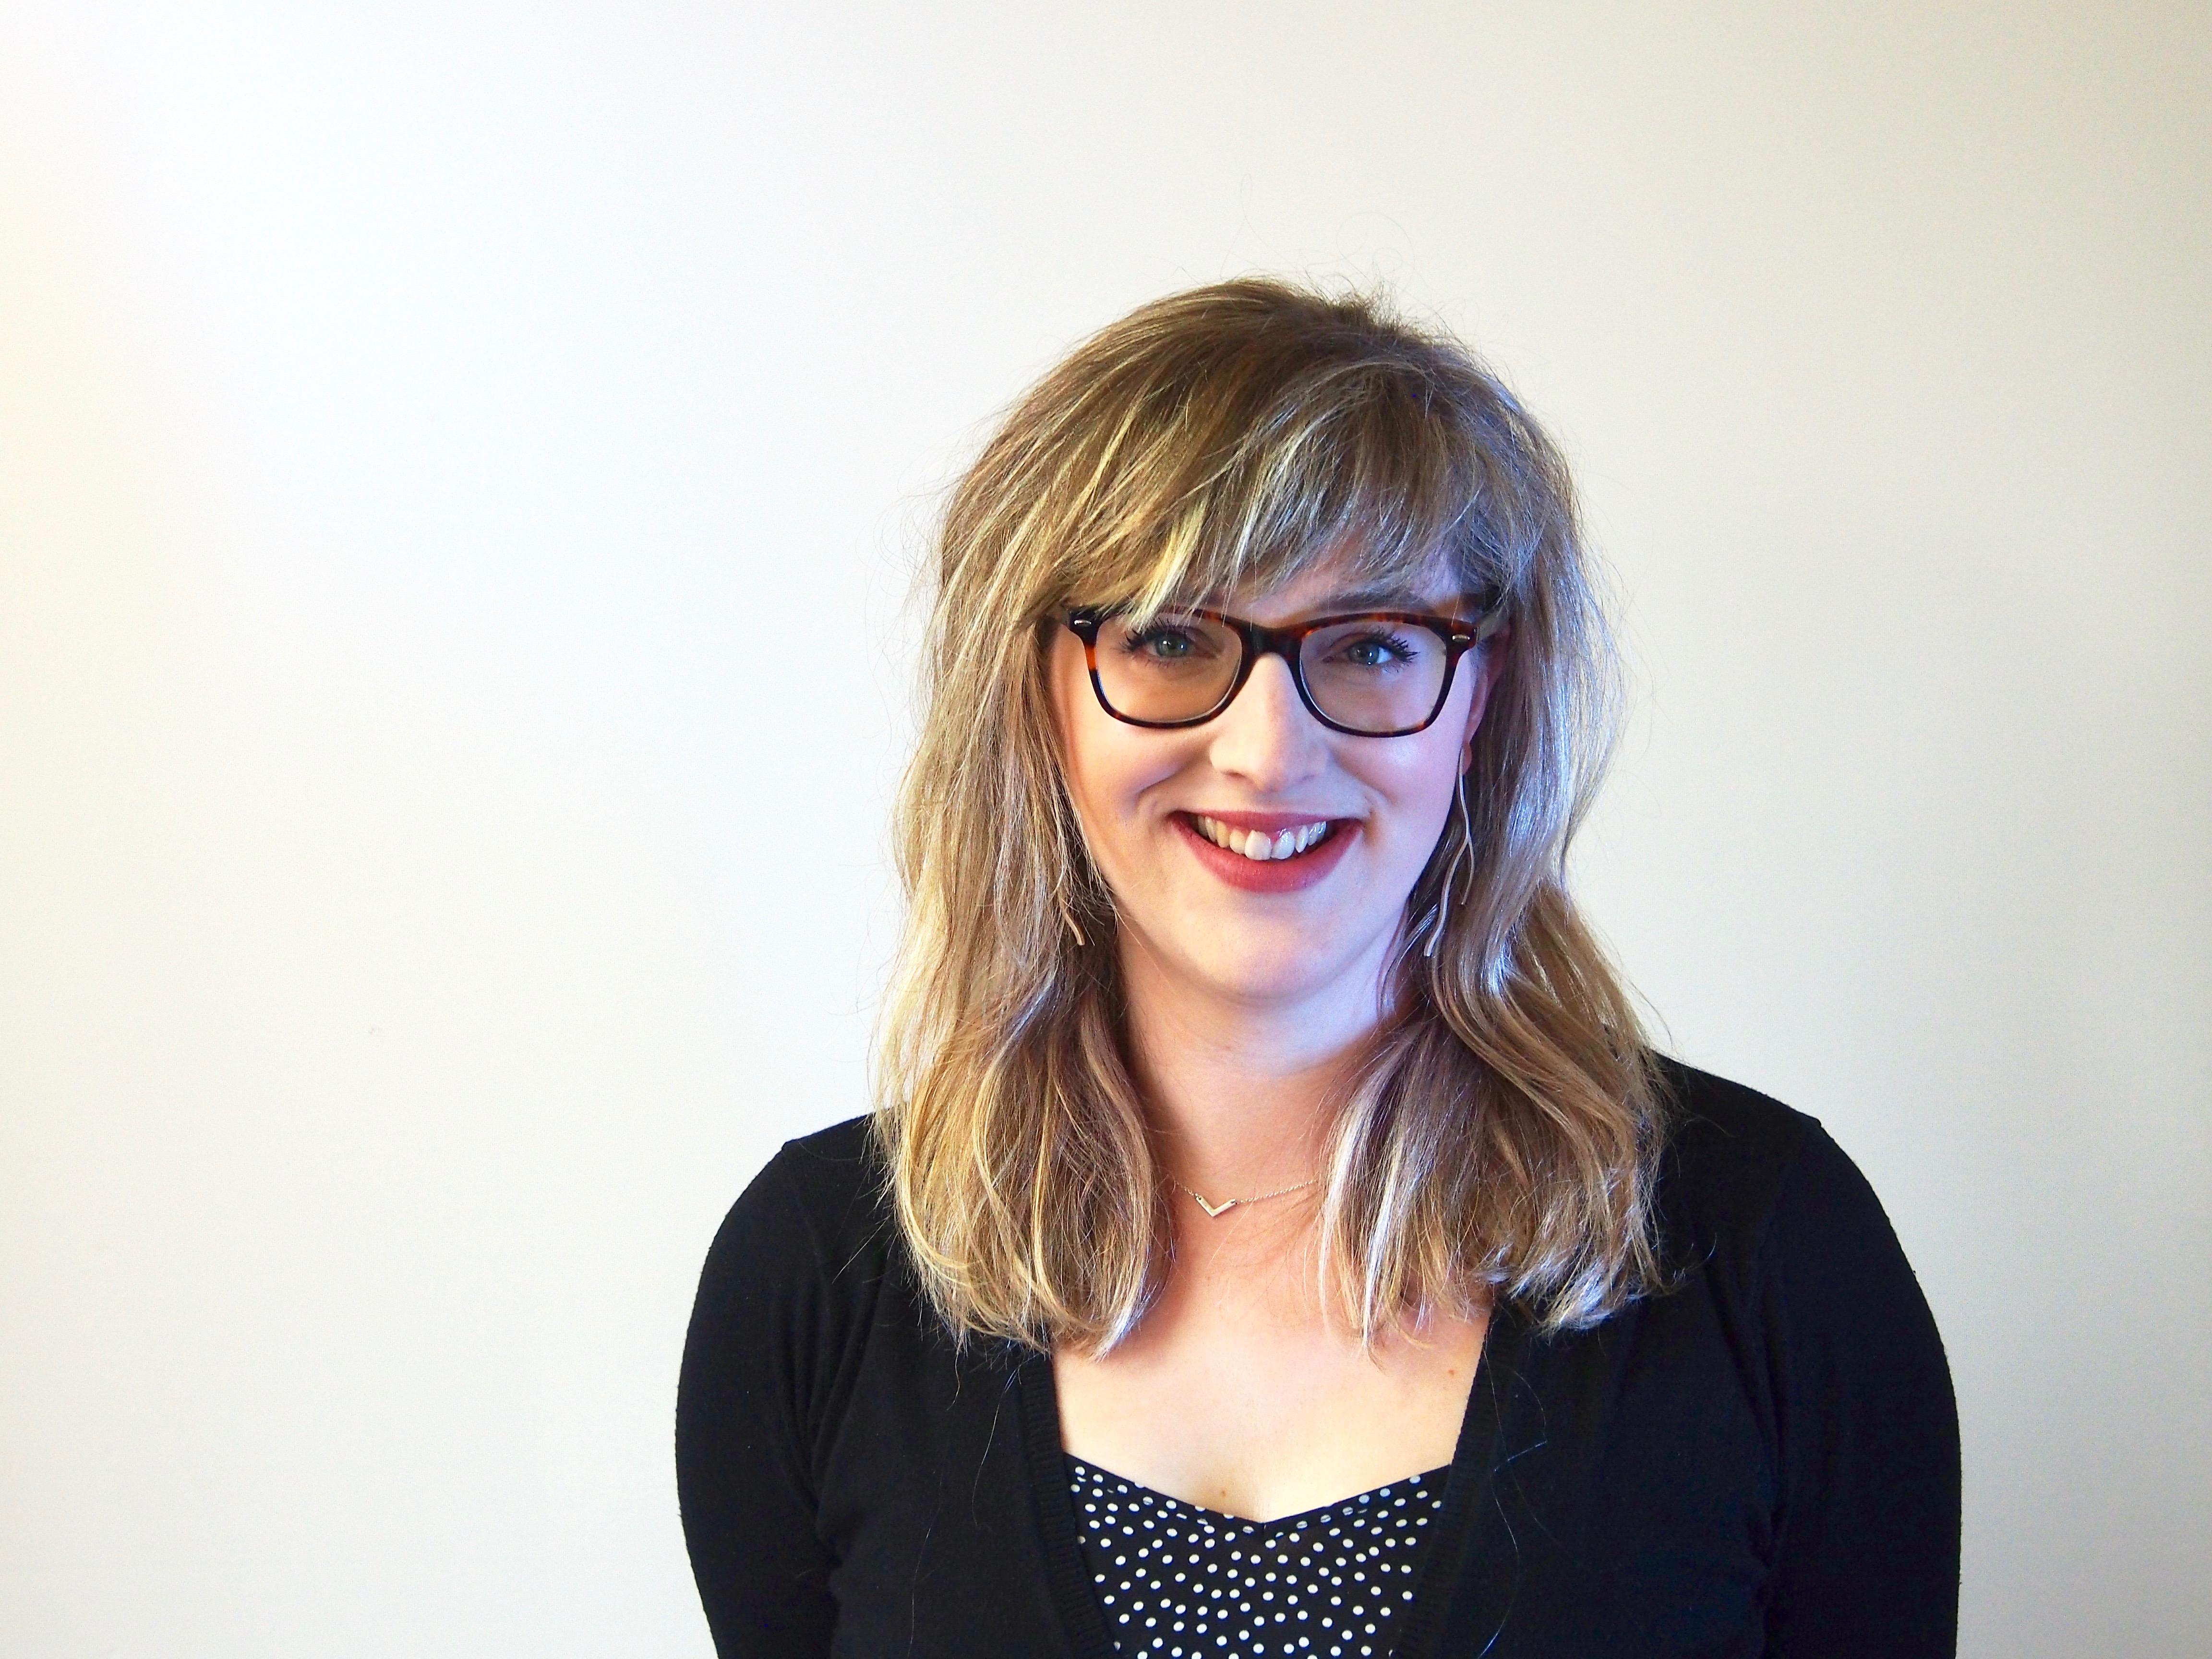 Photograph of Sarah Westmore